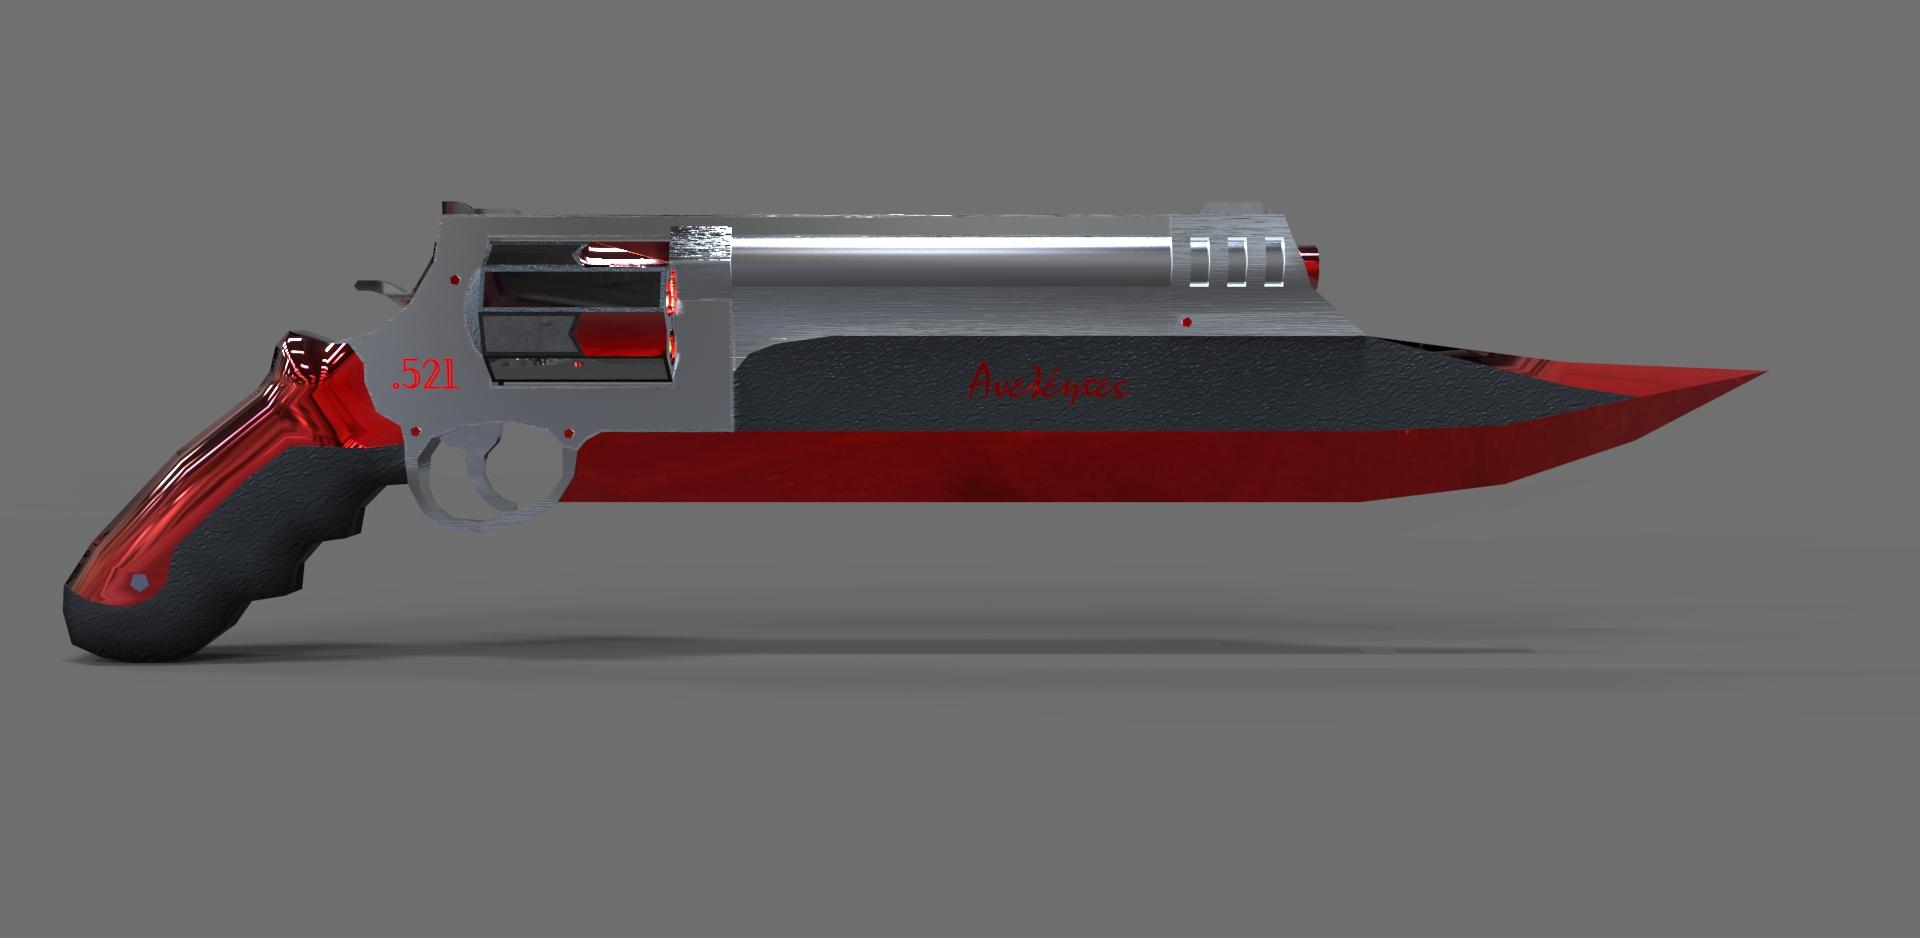 Création d'une Arme - Page 18 Gun_blade_dl__my_render_by_bull3tmodz-d6juhv6